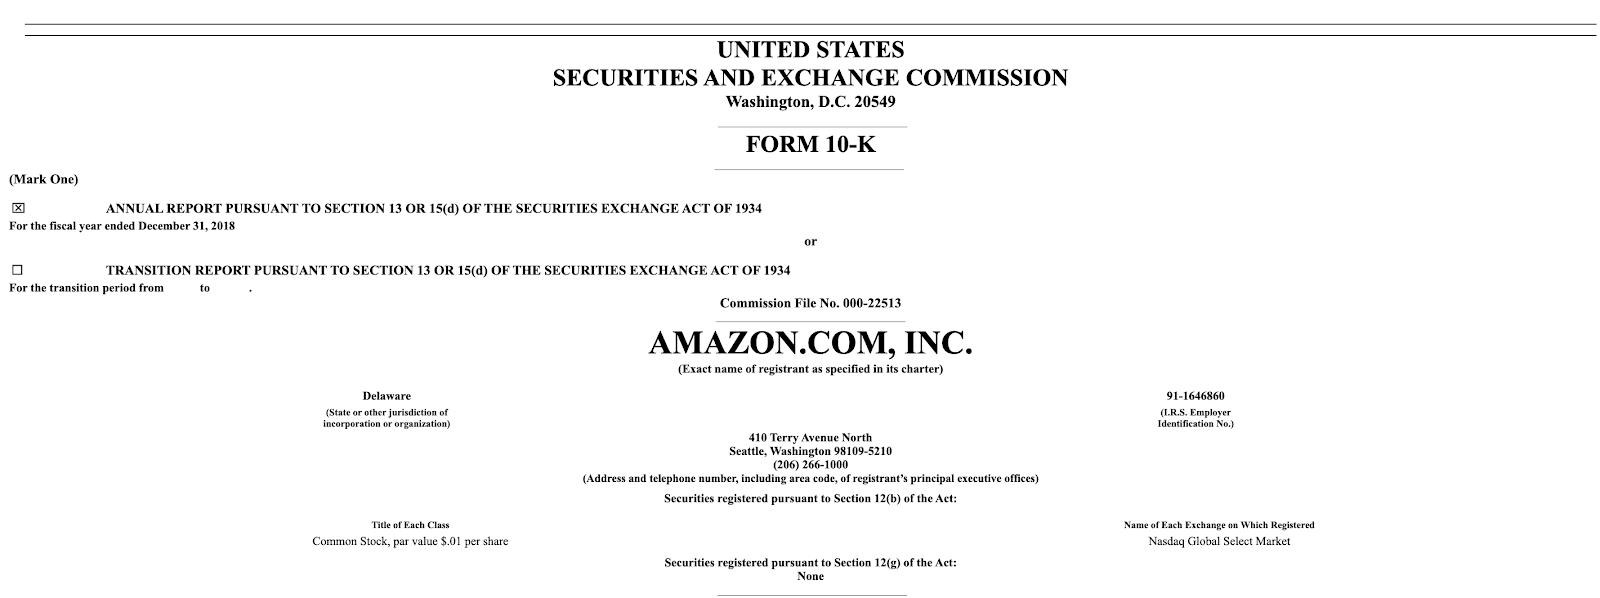 U.S. SEC filing for Amazon.com